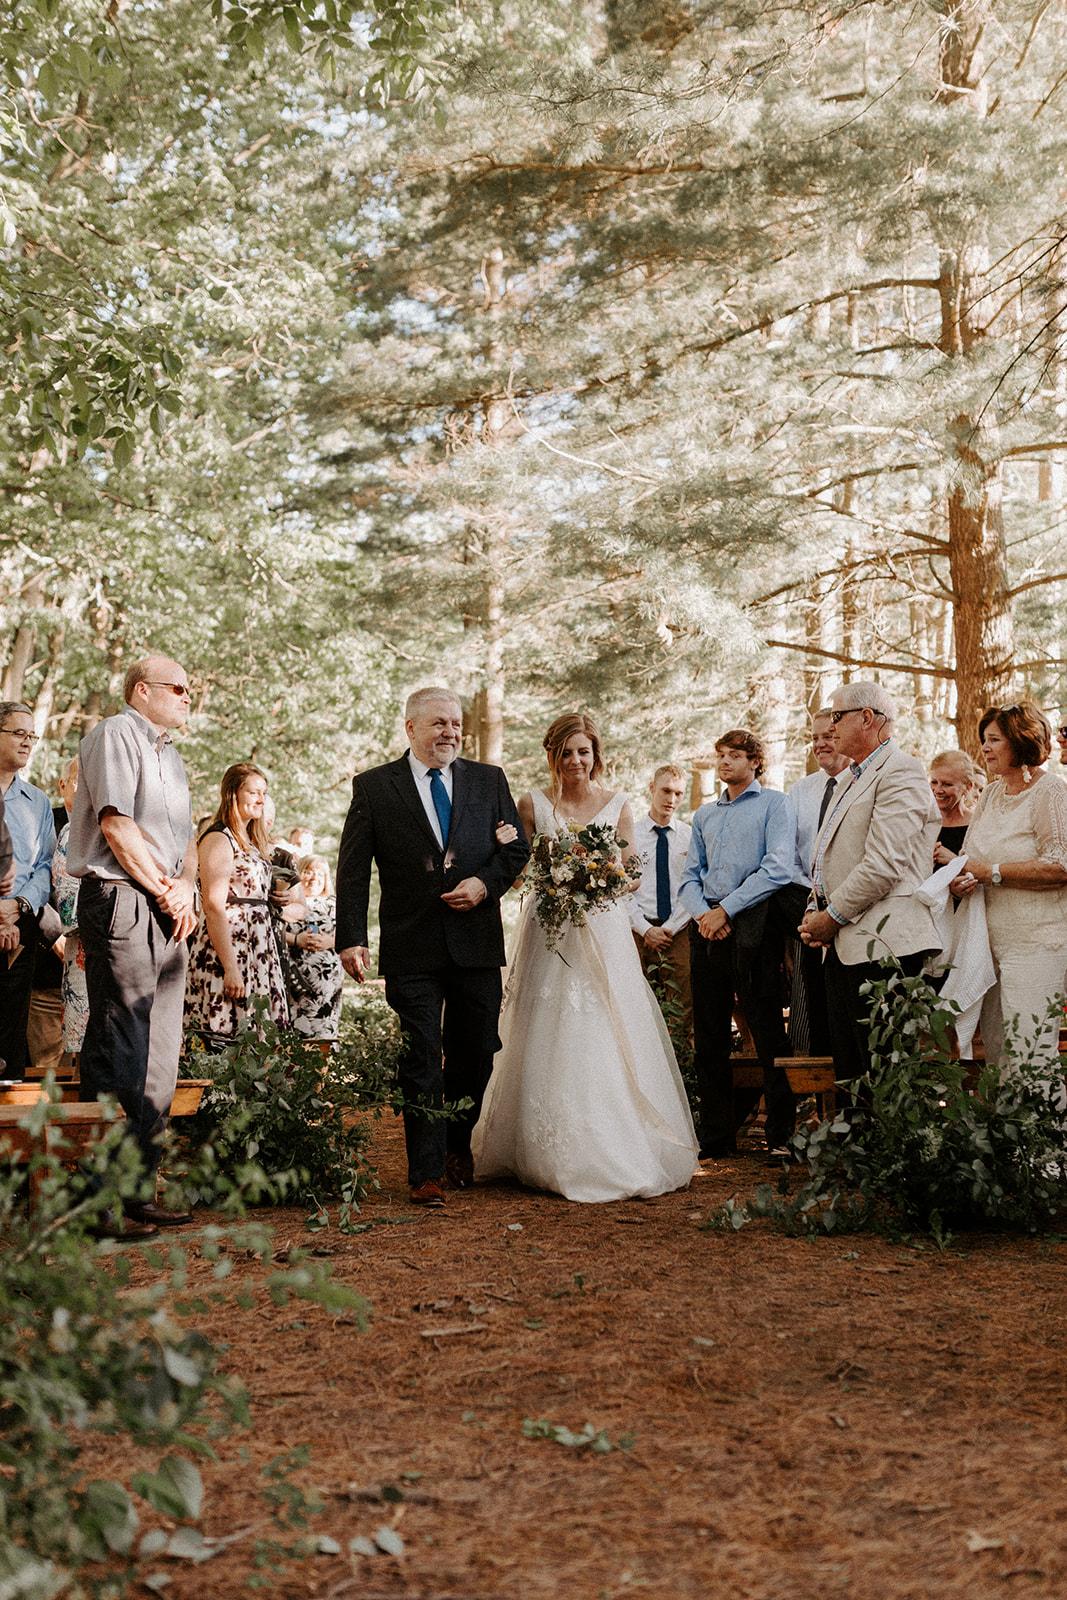 camp_wokanda_peoria_illinois_wedding_photographer_wright_photographs_bliese_0202.jpg